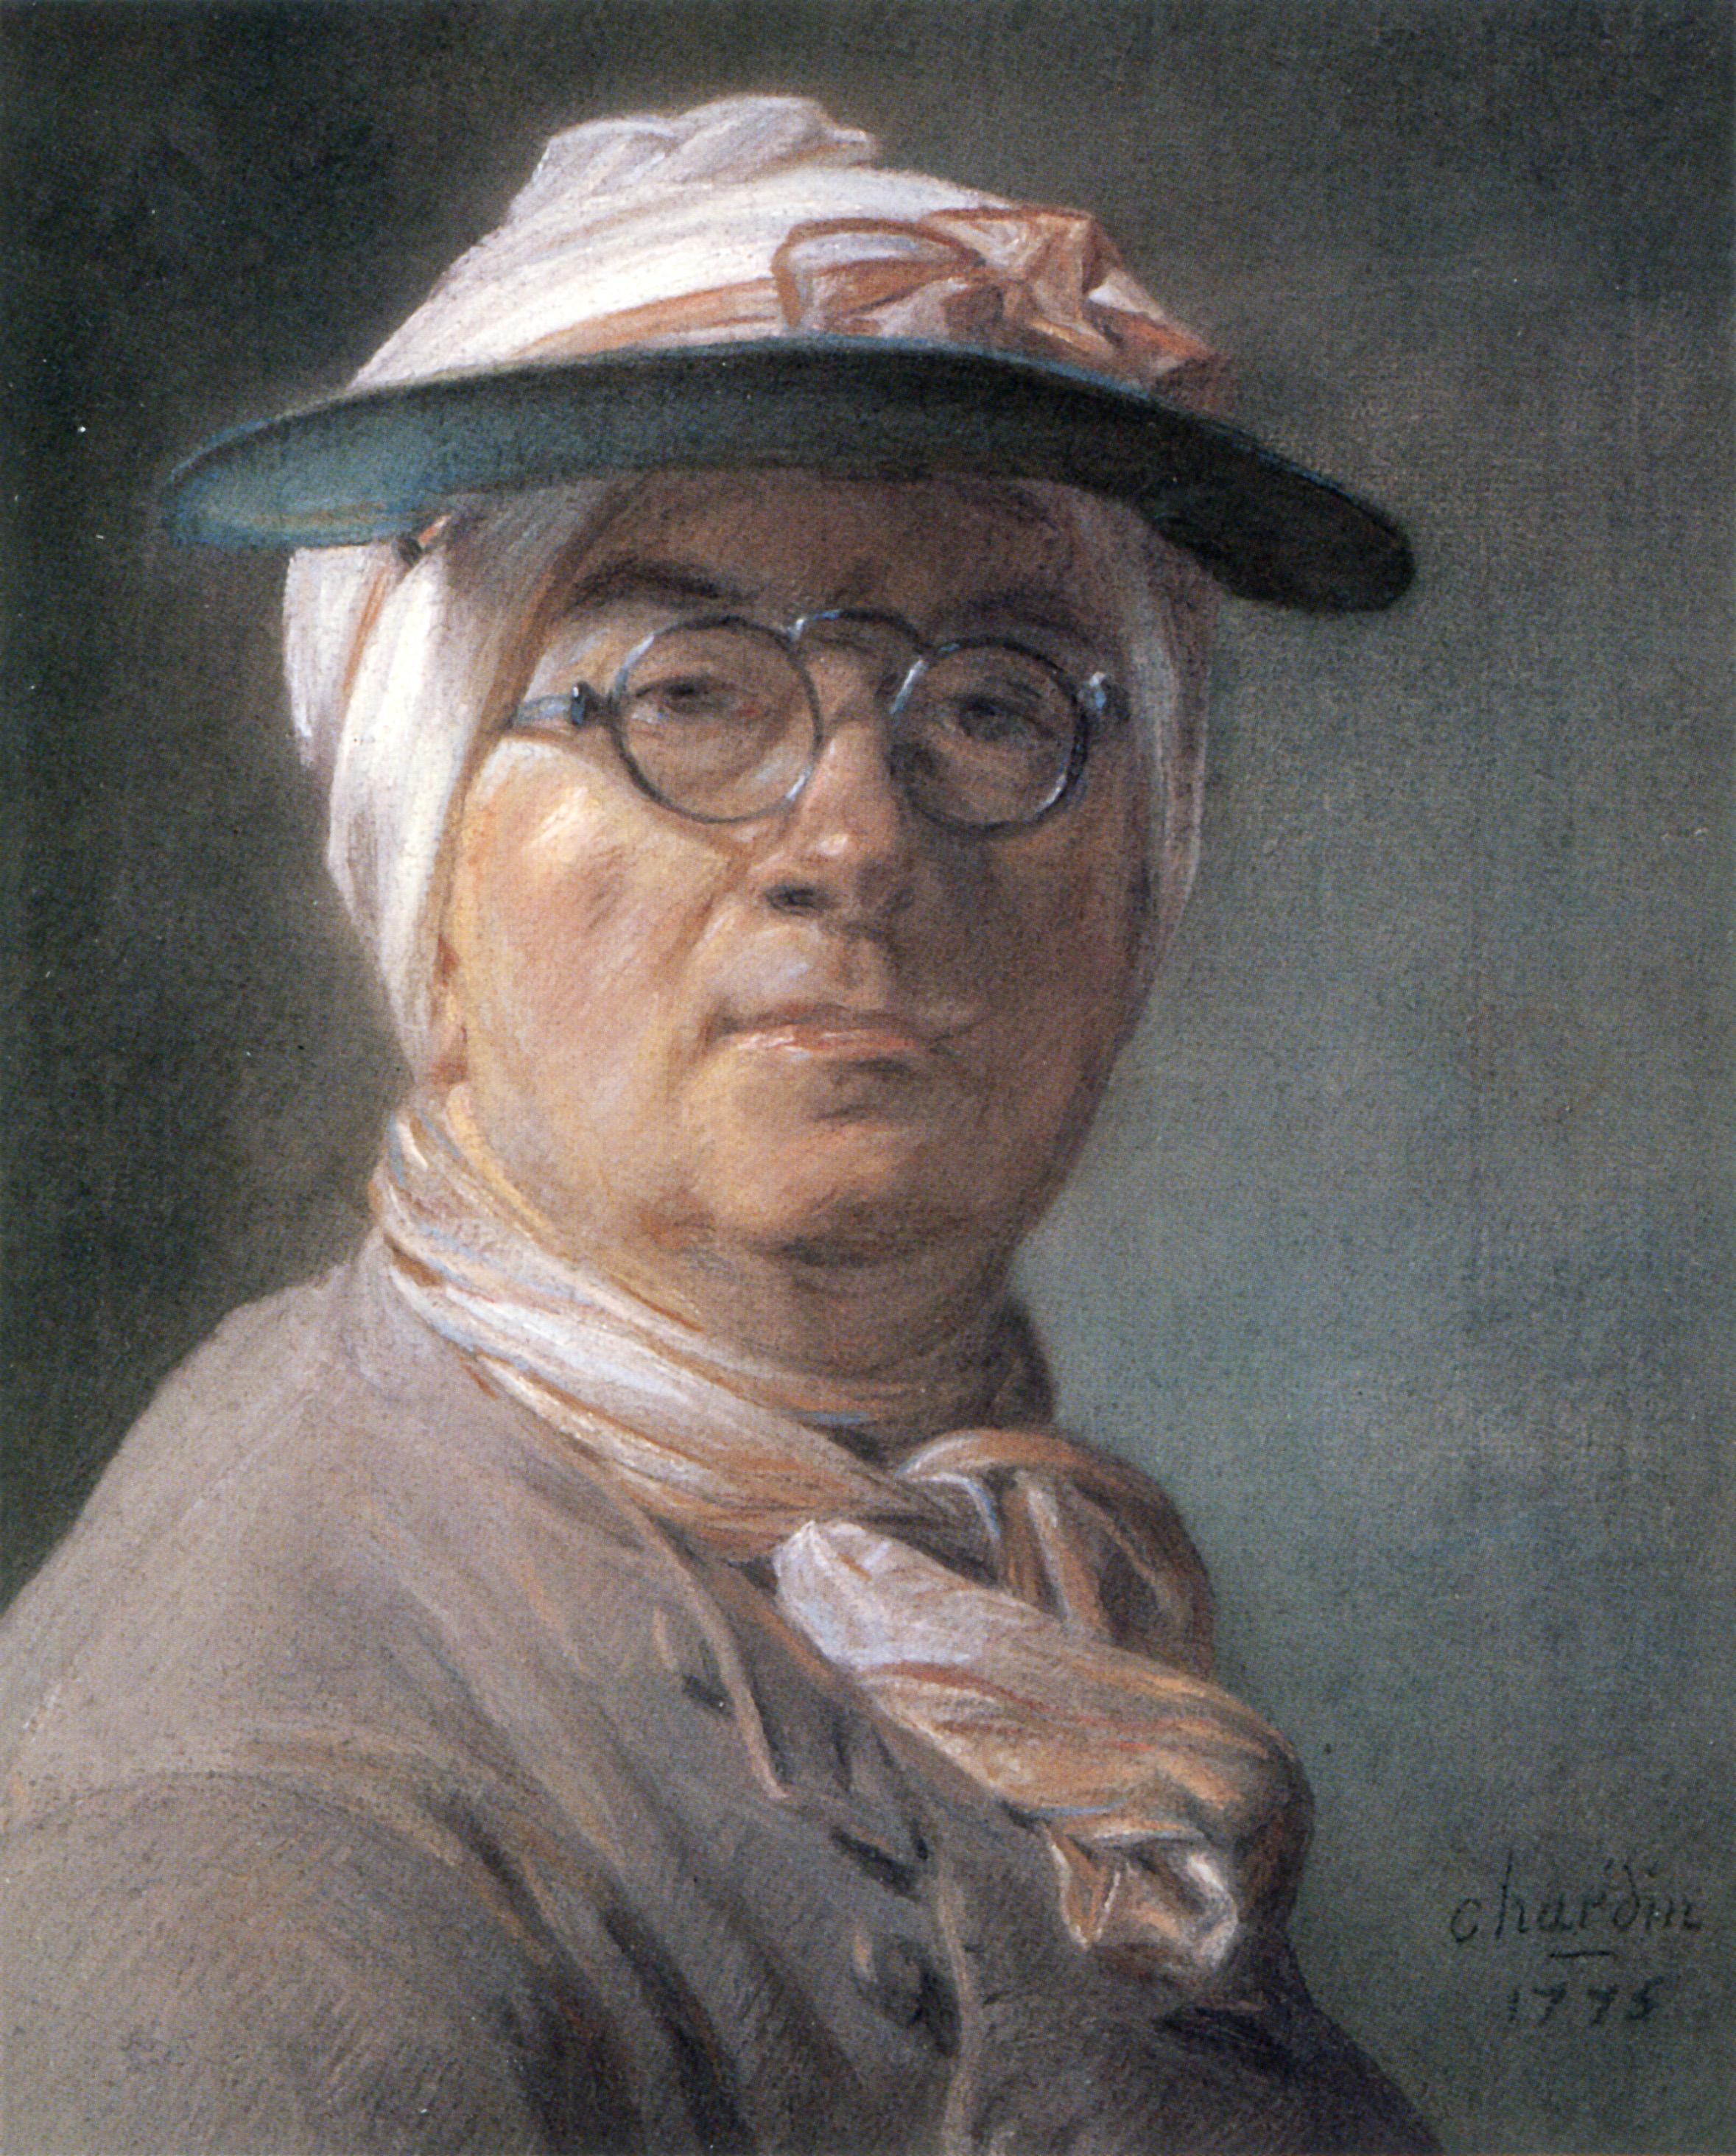 SELF-PORT RAIT WITH GLASSES -- JEAN BAPTISTE SIMÉON CHARDIN, 1775